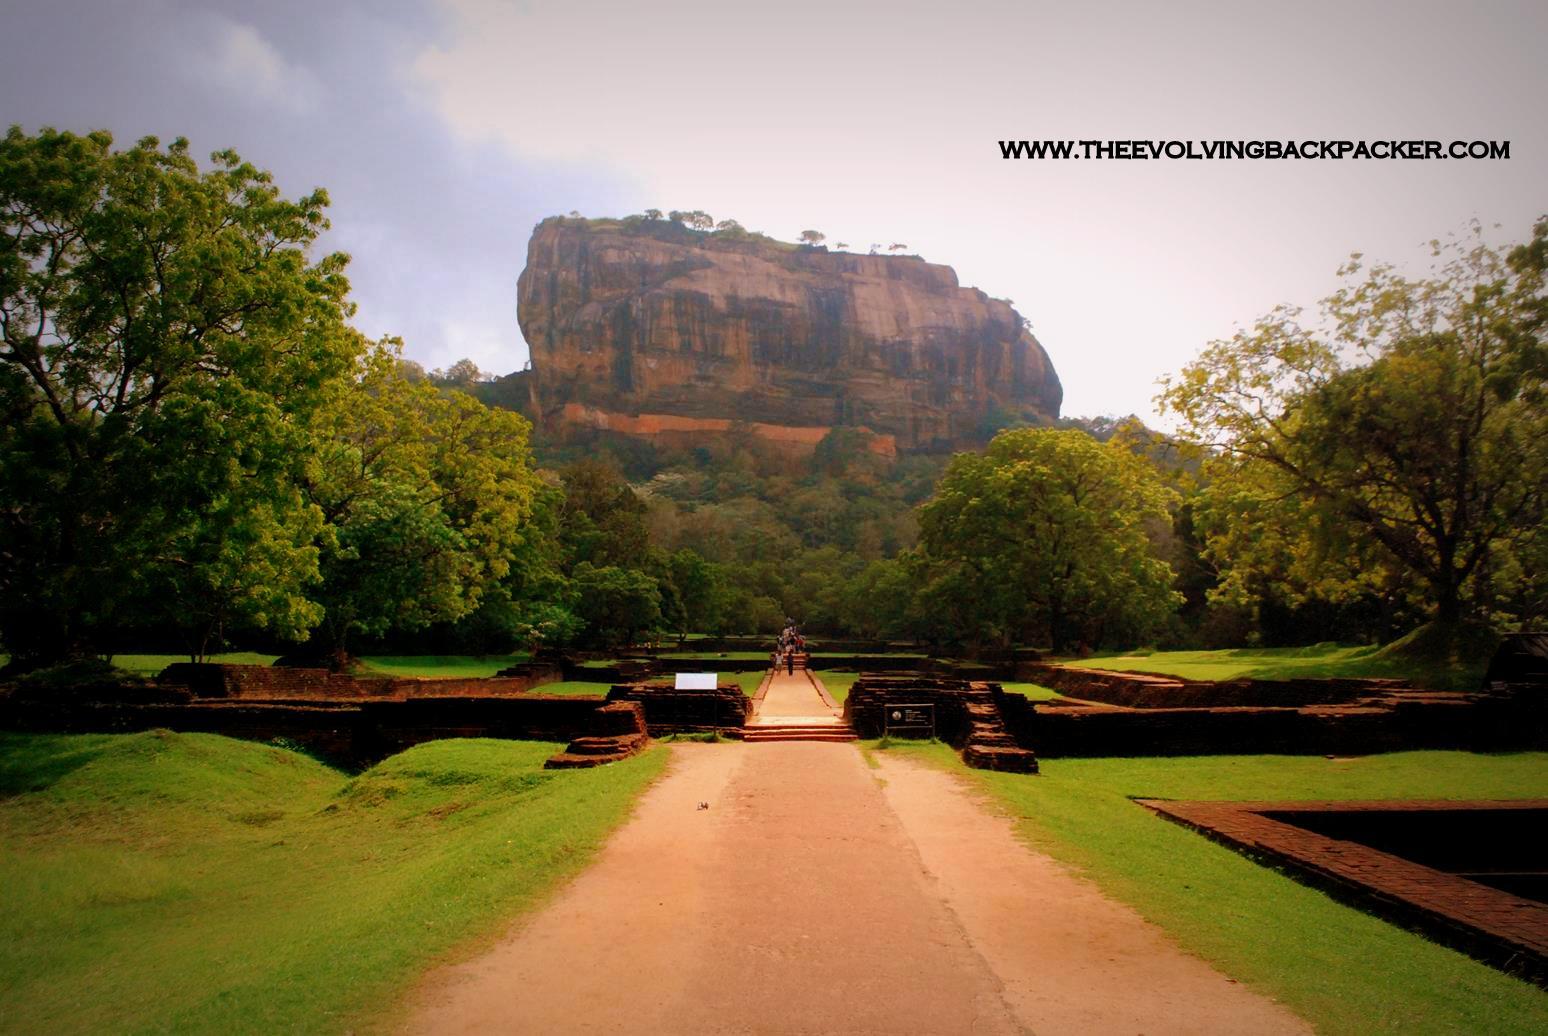 Kandy – Sigiriya and Dambulla – A Huge Boulder and some restive Buddhas